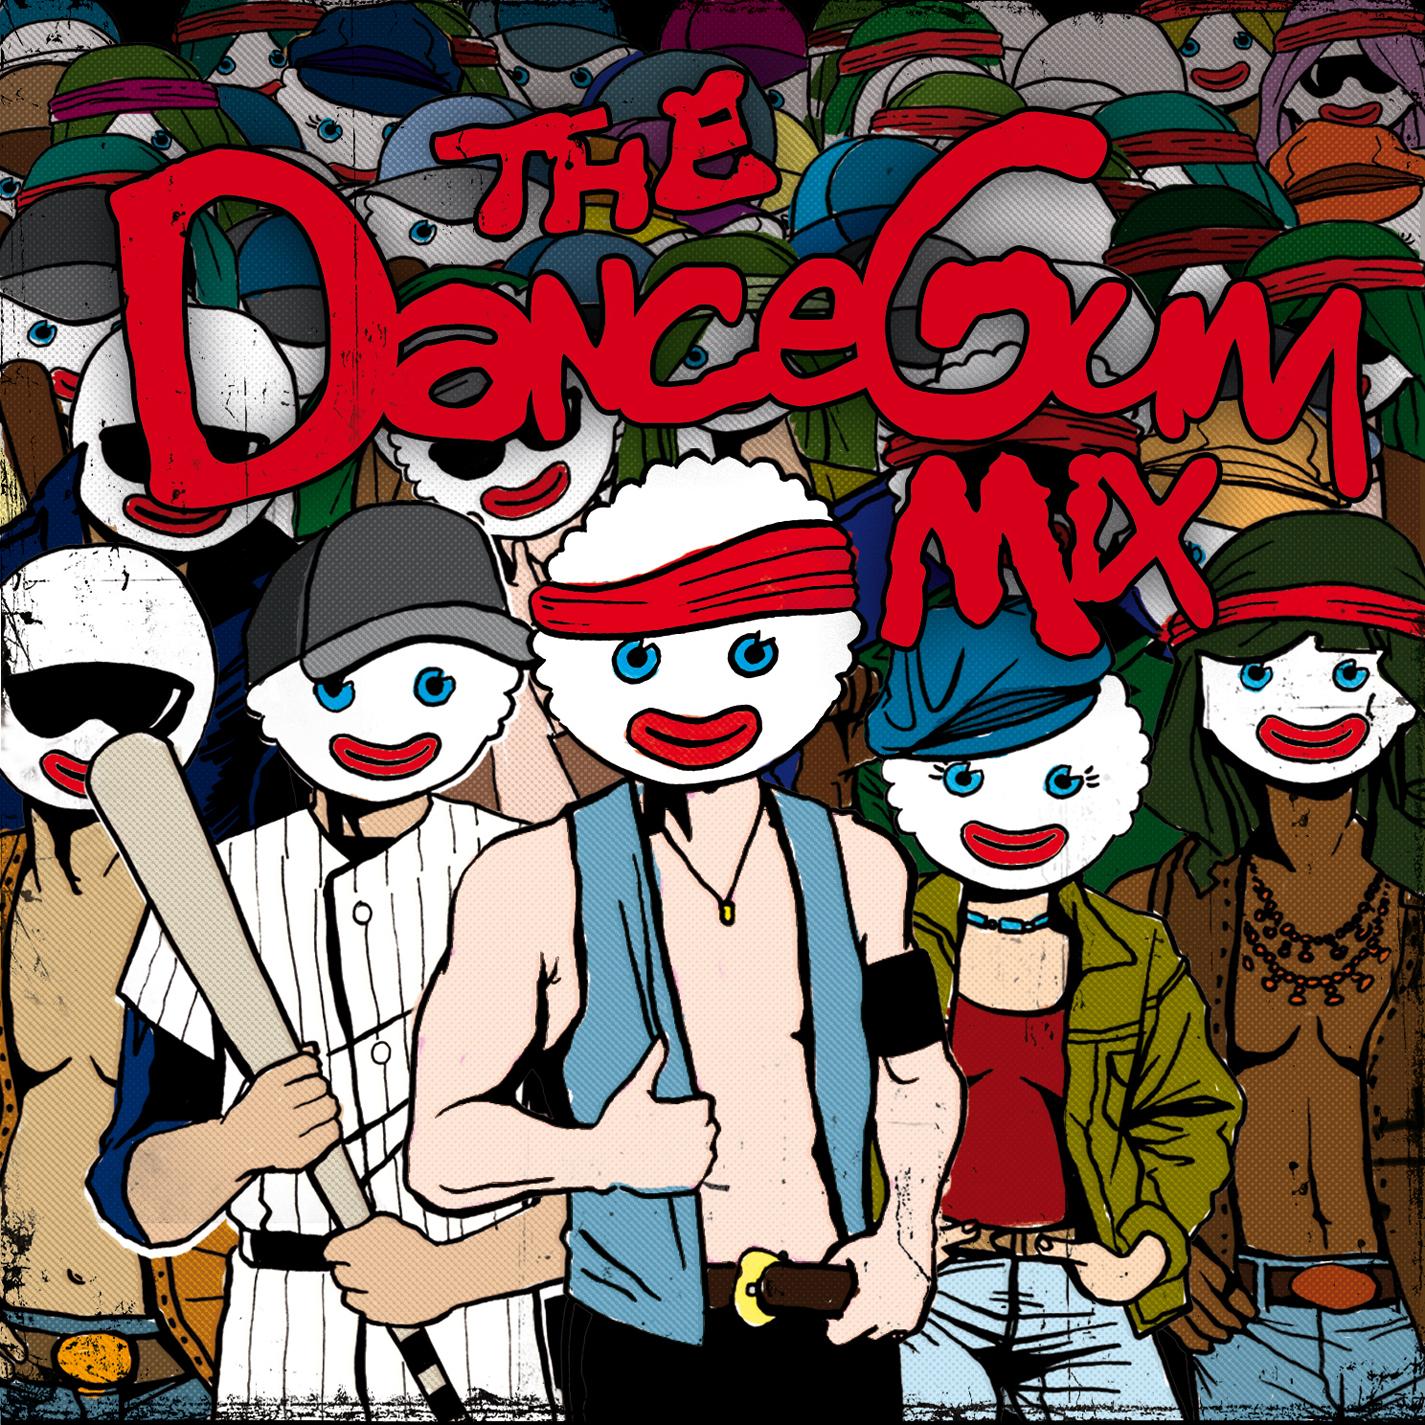 DV005 / Useless Wooden Toys - The DanceGum Mix